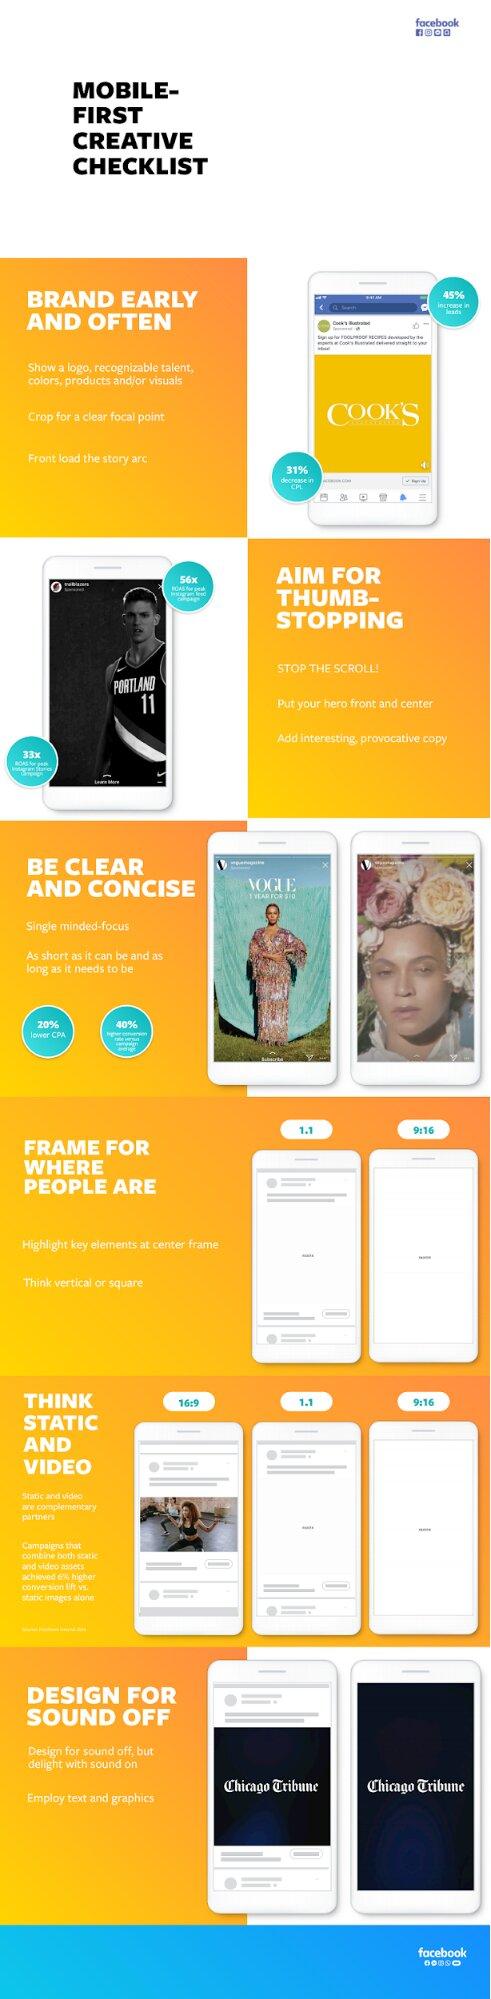 Consejos Mobile-First de Facebook Business